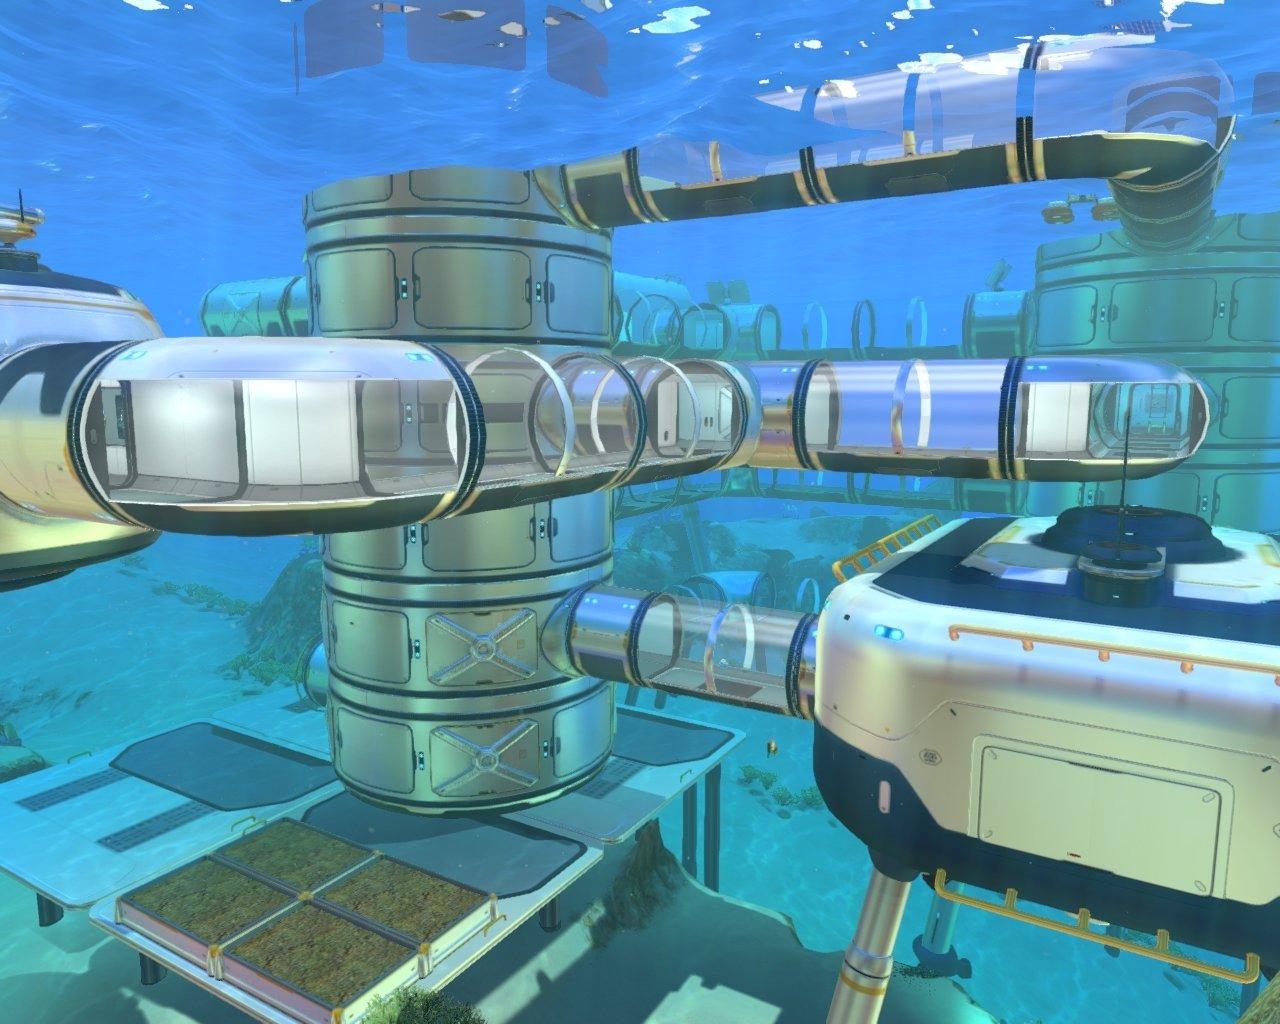 Subnautica Scanner Room Connect / This is subnautica gameplay, part 31.